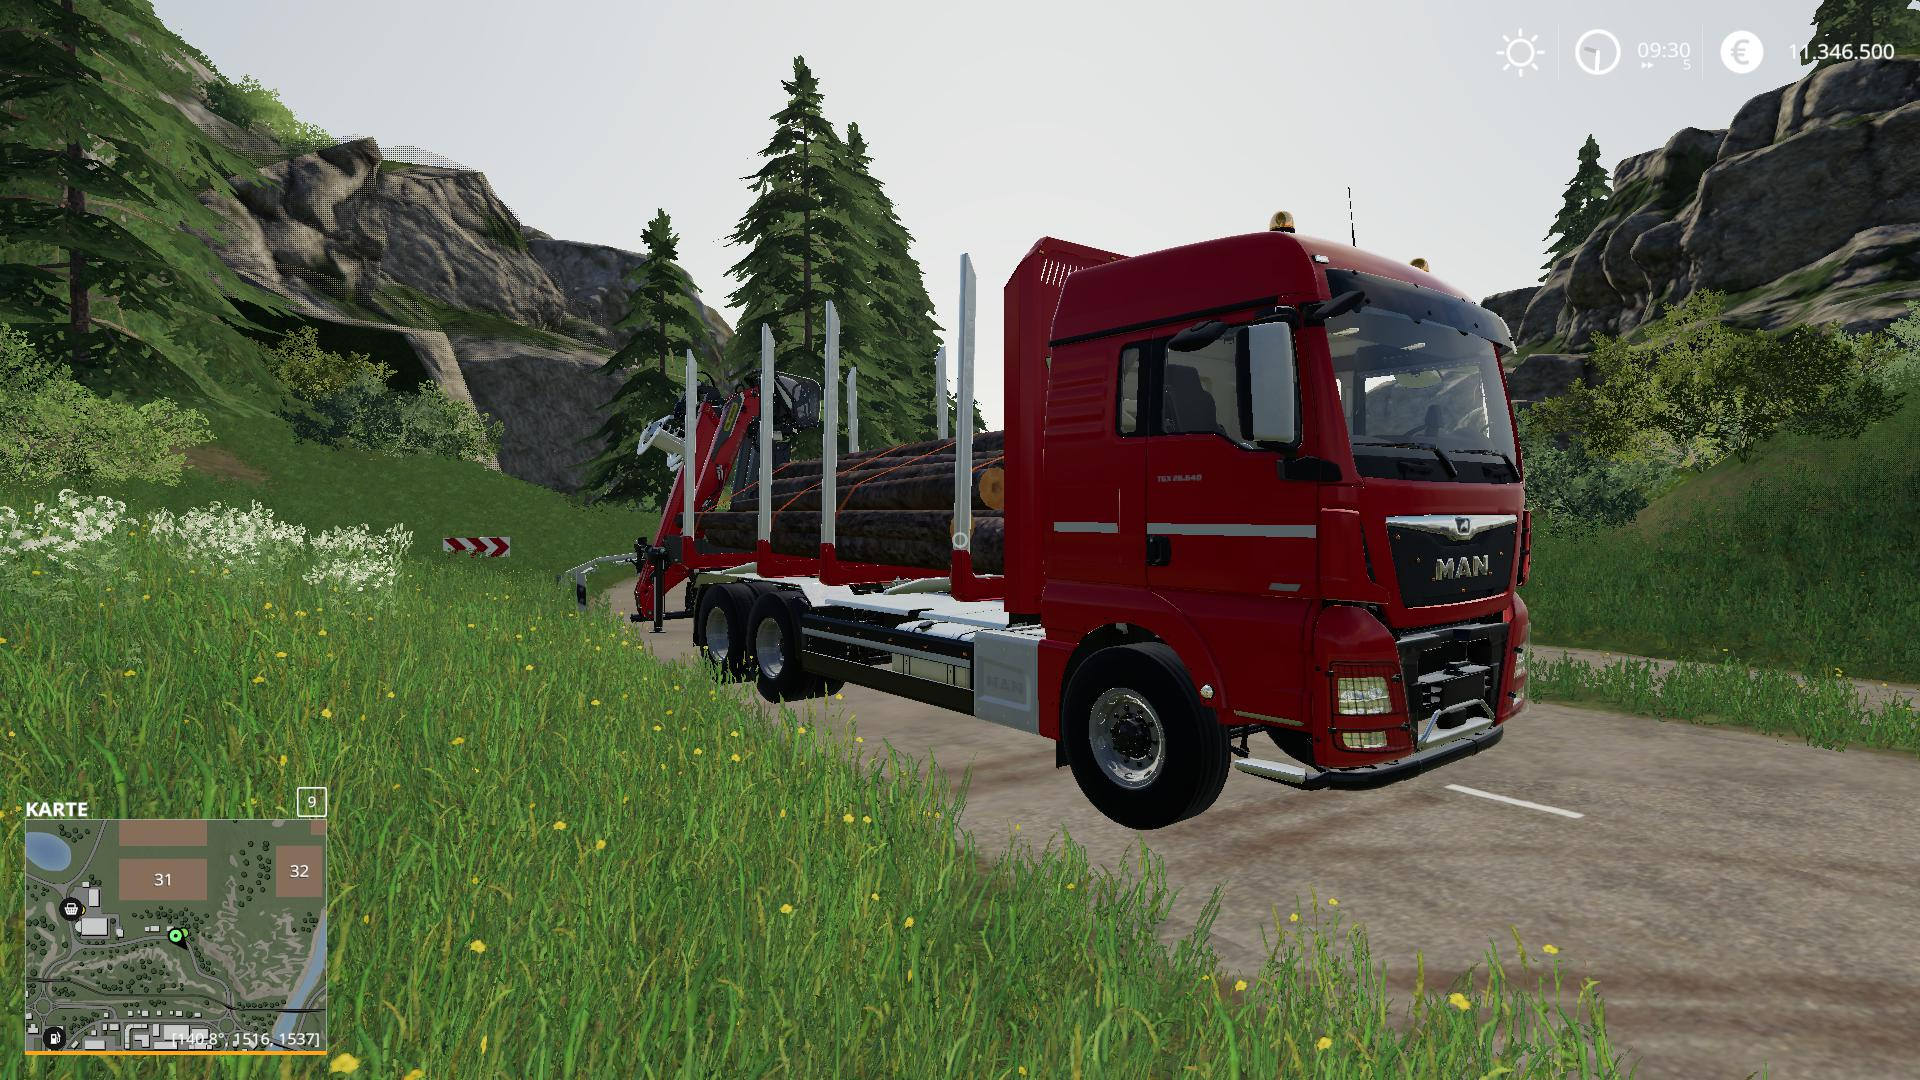 MAN Forst LKW with Autoload Wood v2 0 FS19 - Farming Simulator 19